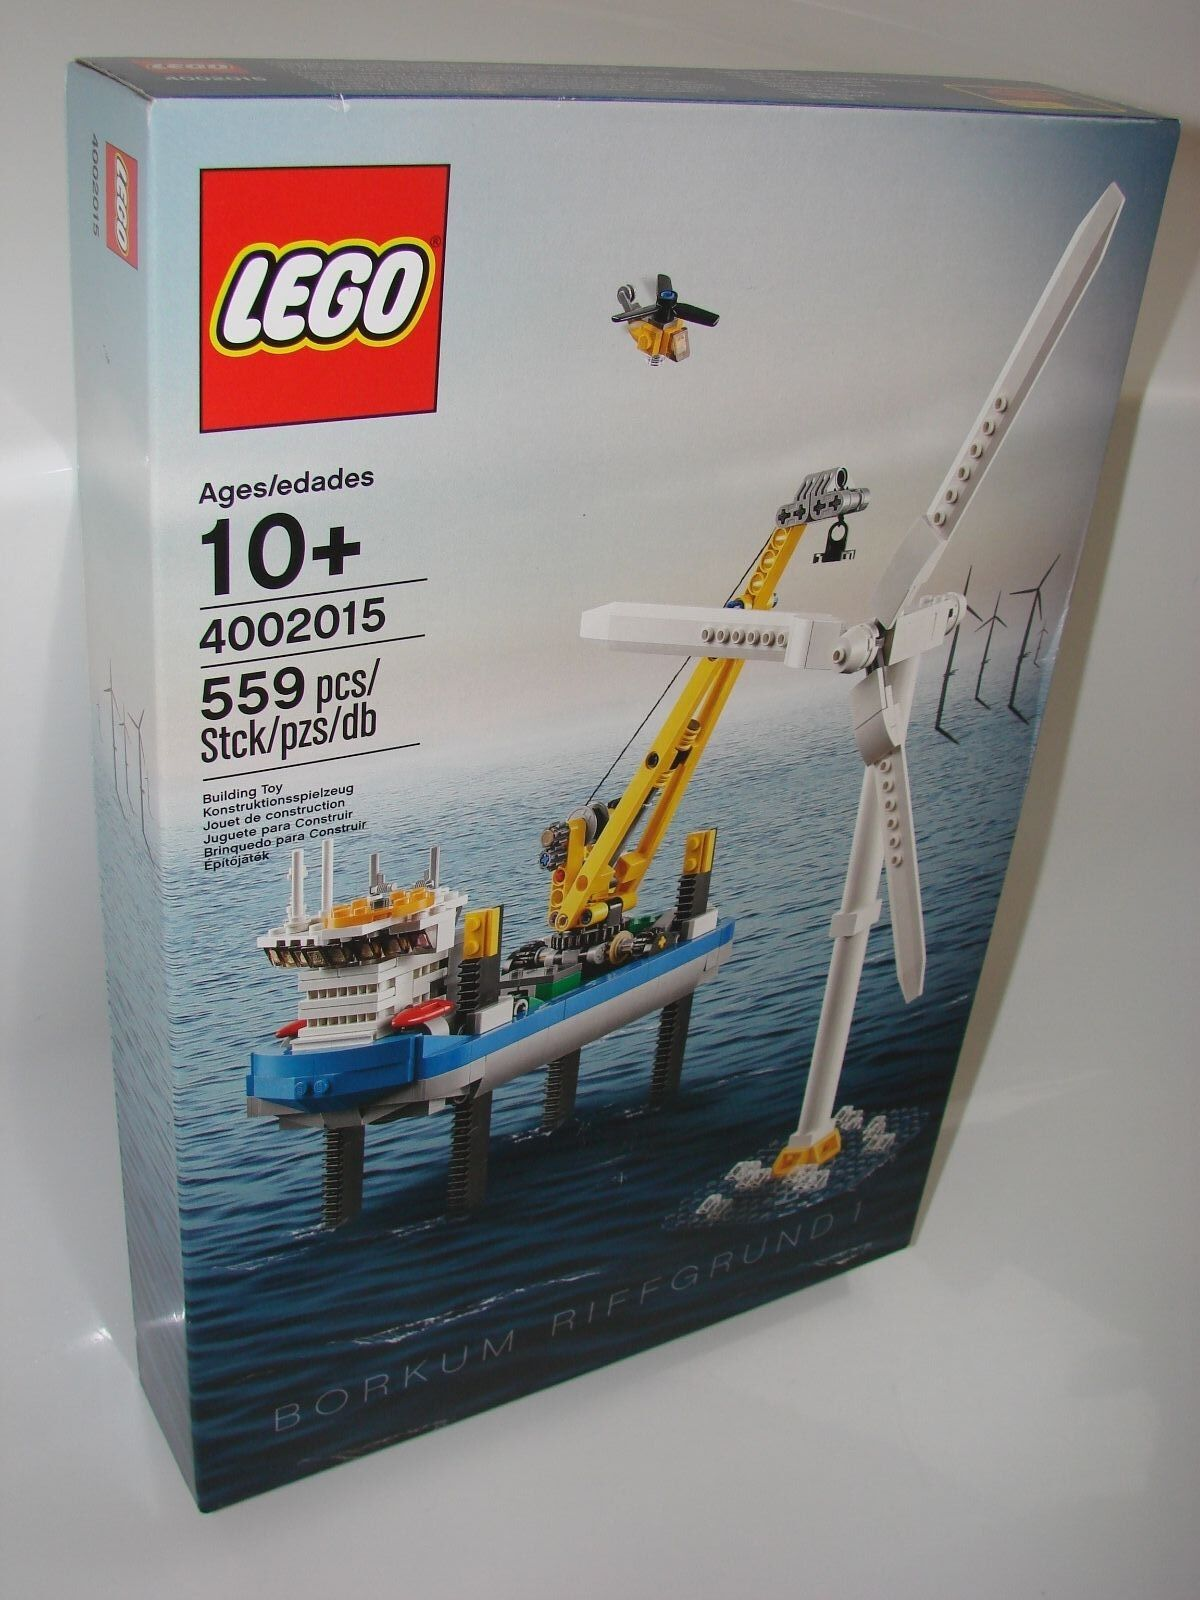 Lego  Miscellaneous 4002018 borkum riffgrund 1 nuevo embalaje original New misb NRFB